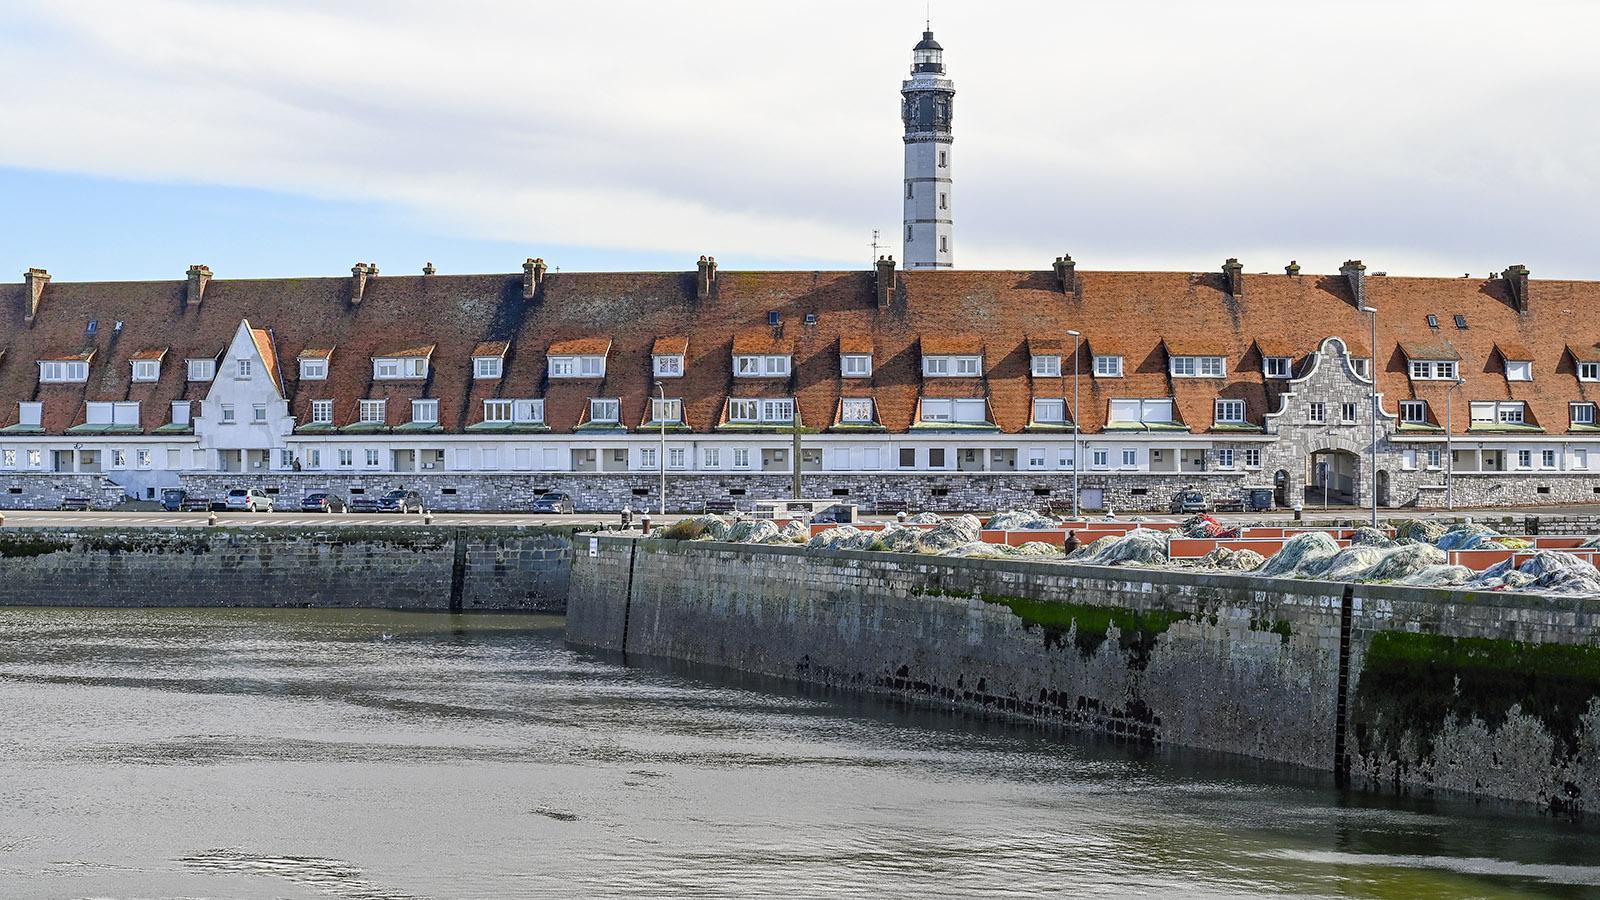 Der Quai Auguste Delpierre von Calais. Foto: Hilke Maunder